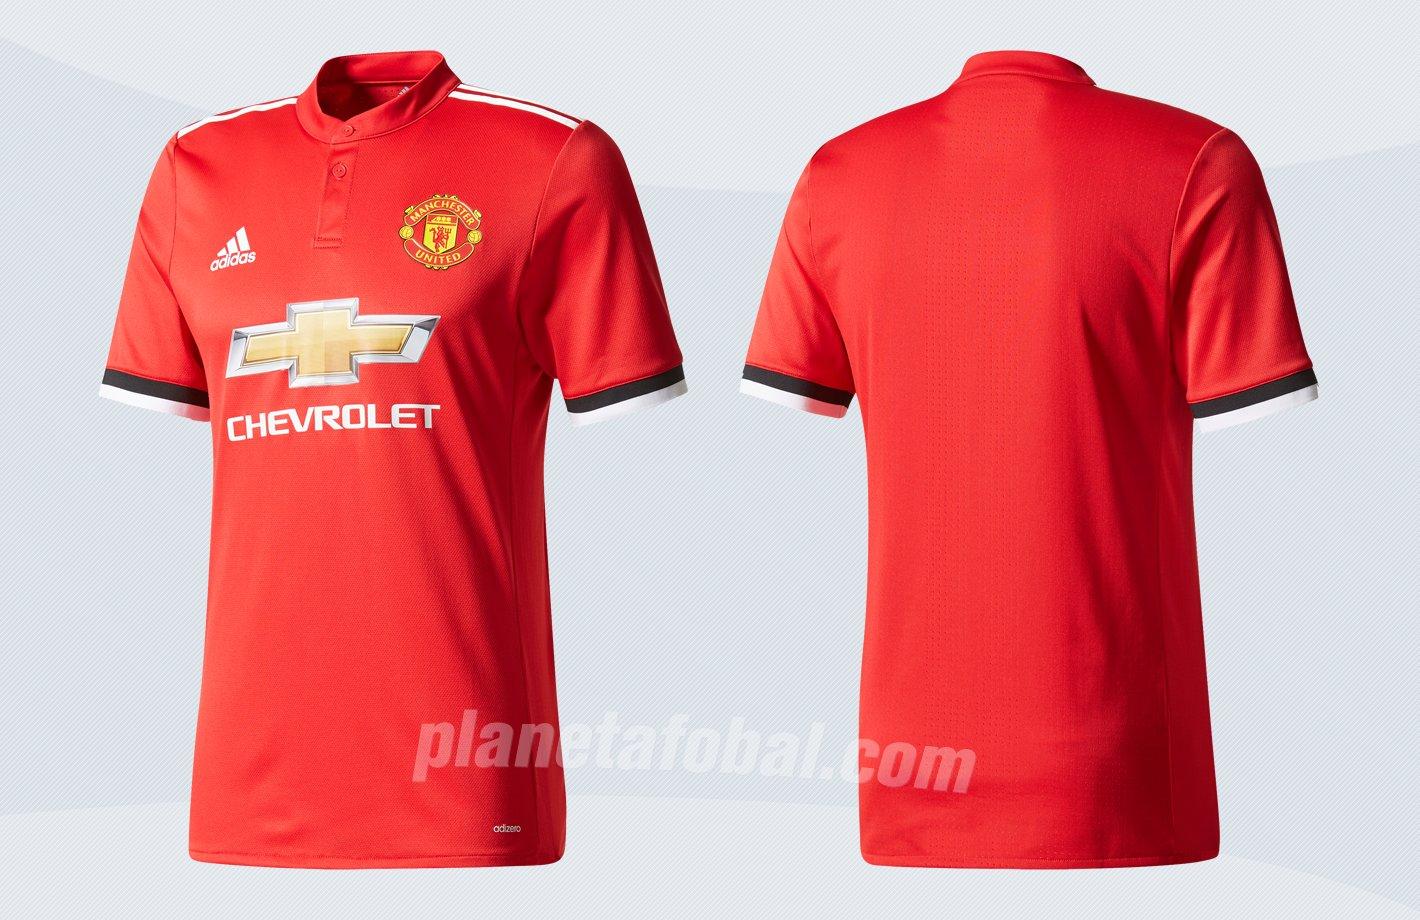 Nueva camiseta titular 2017-18 del United | Imágenes Adidas